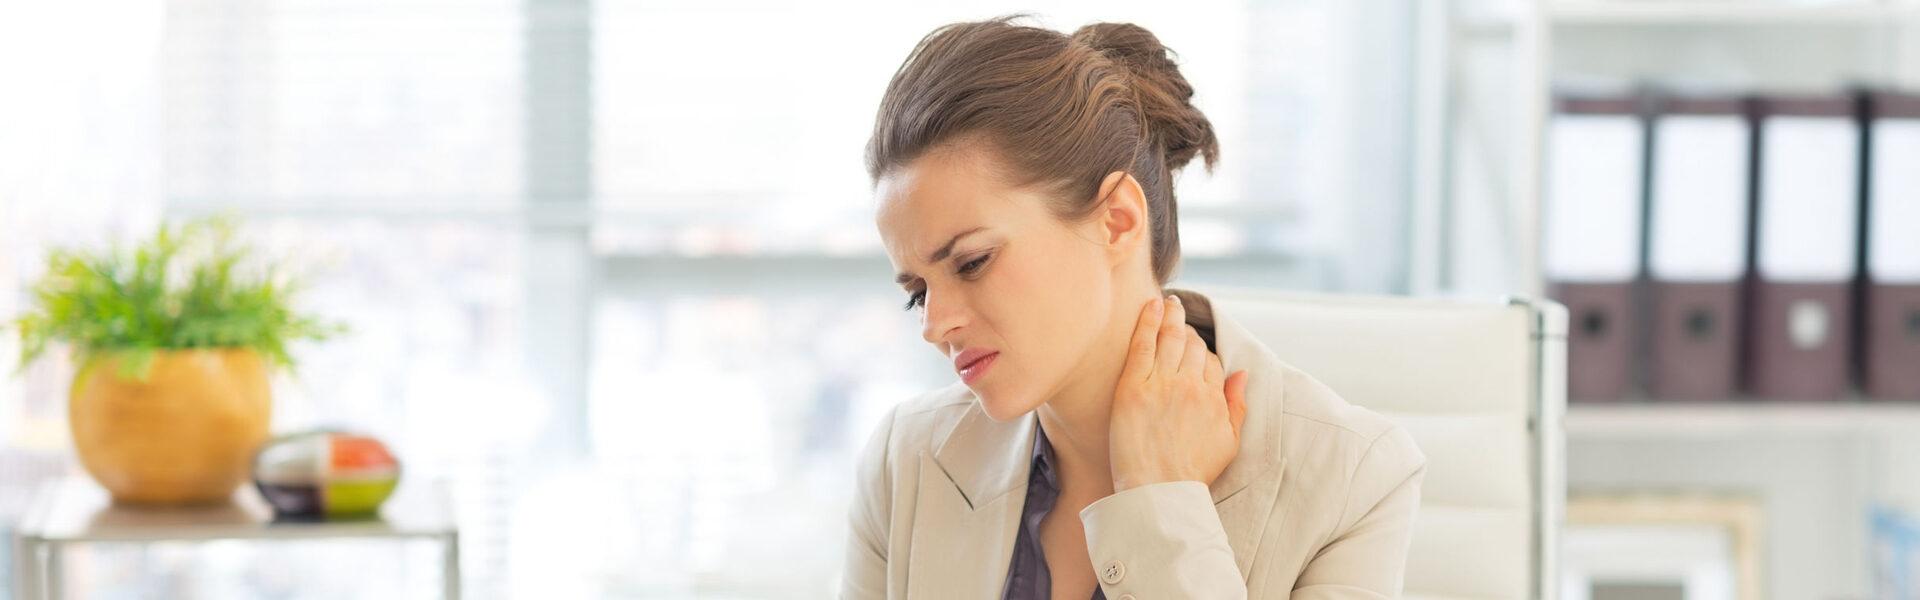 Neck Pain Treatment in Traverse City, MI